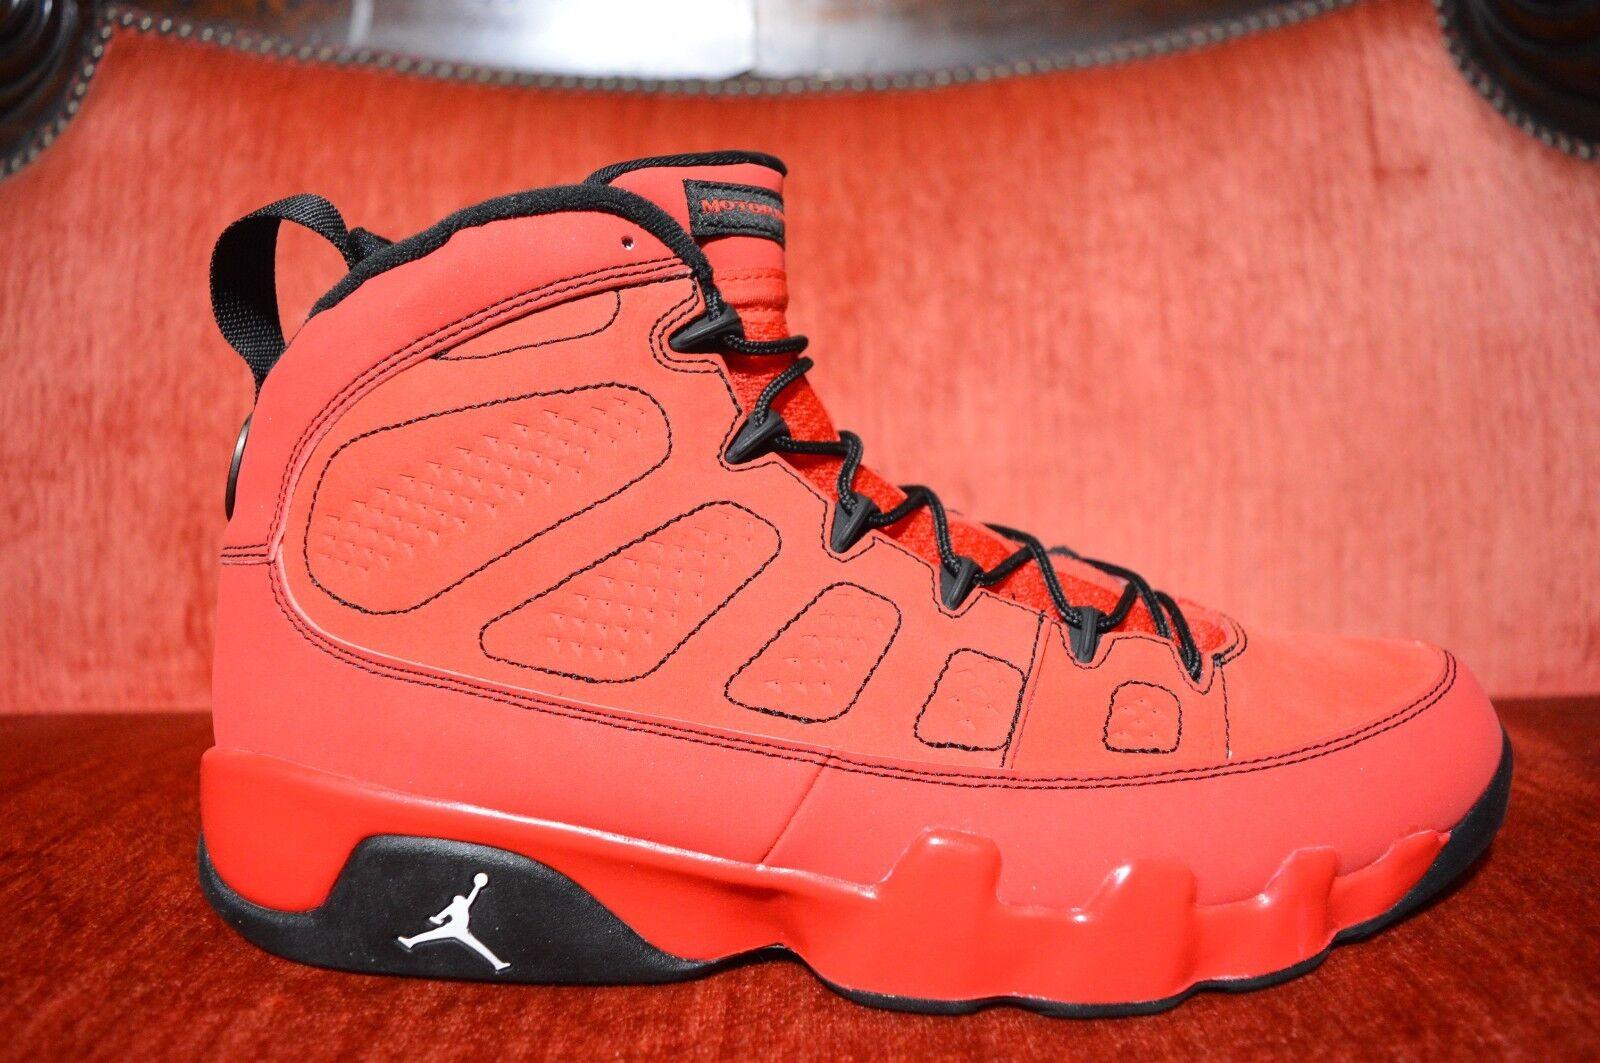 WORN 1X Nike Air Retro Jordan 9 IX Motorboat Jones Red 302370-645 Size 11